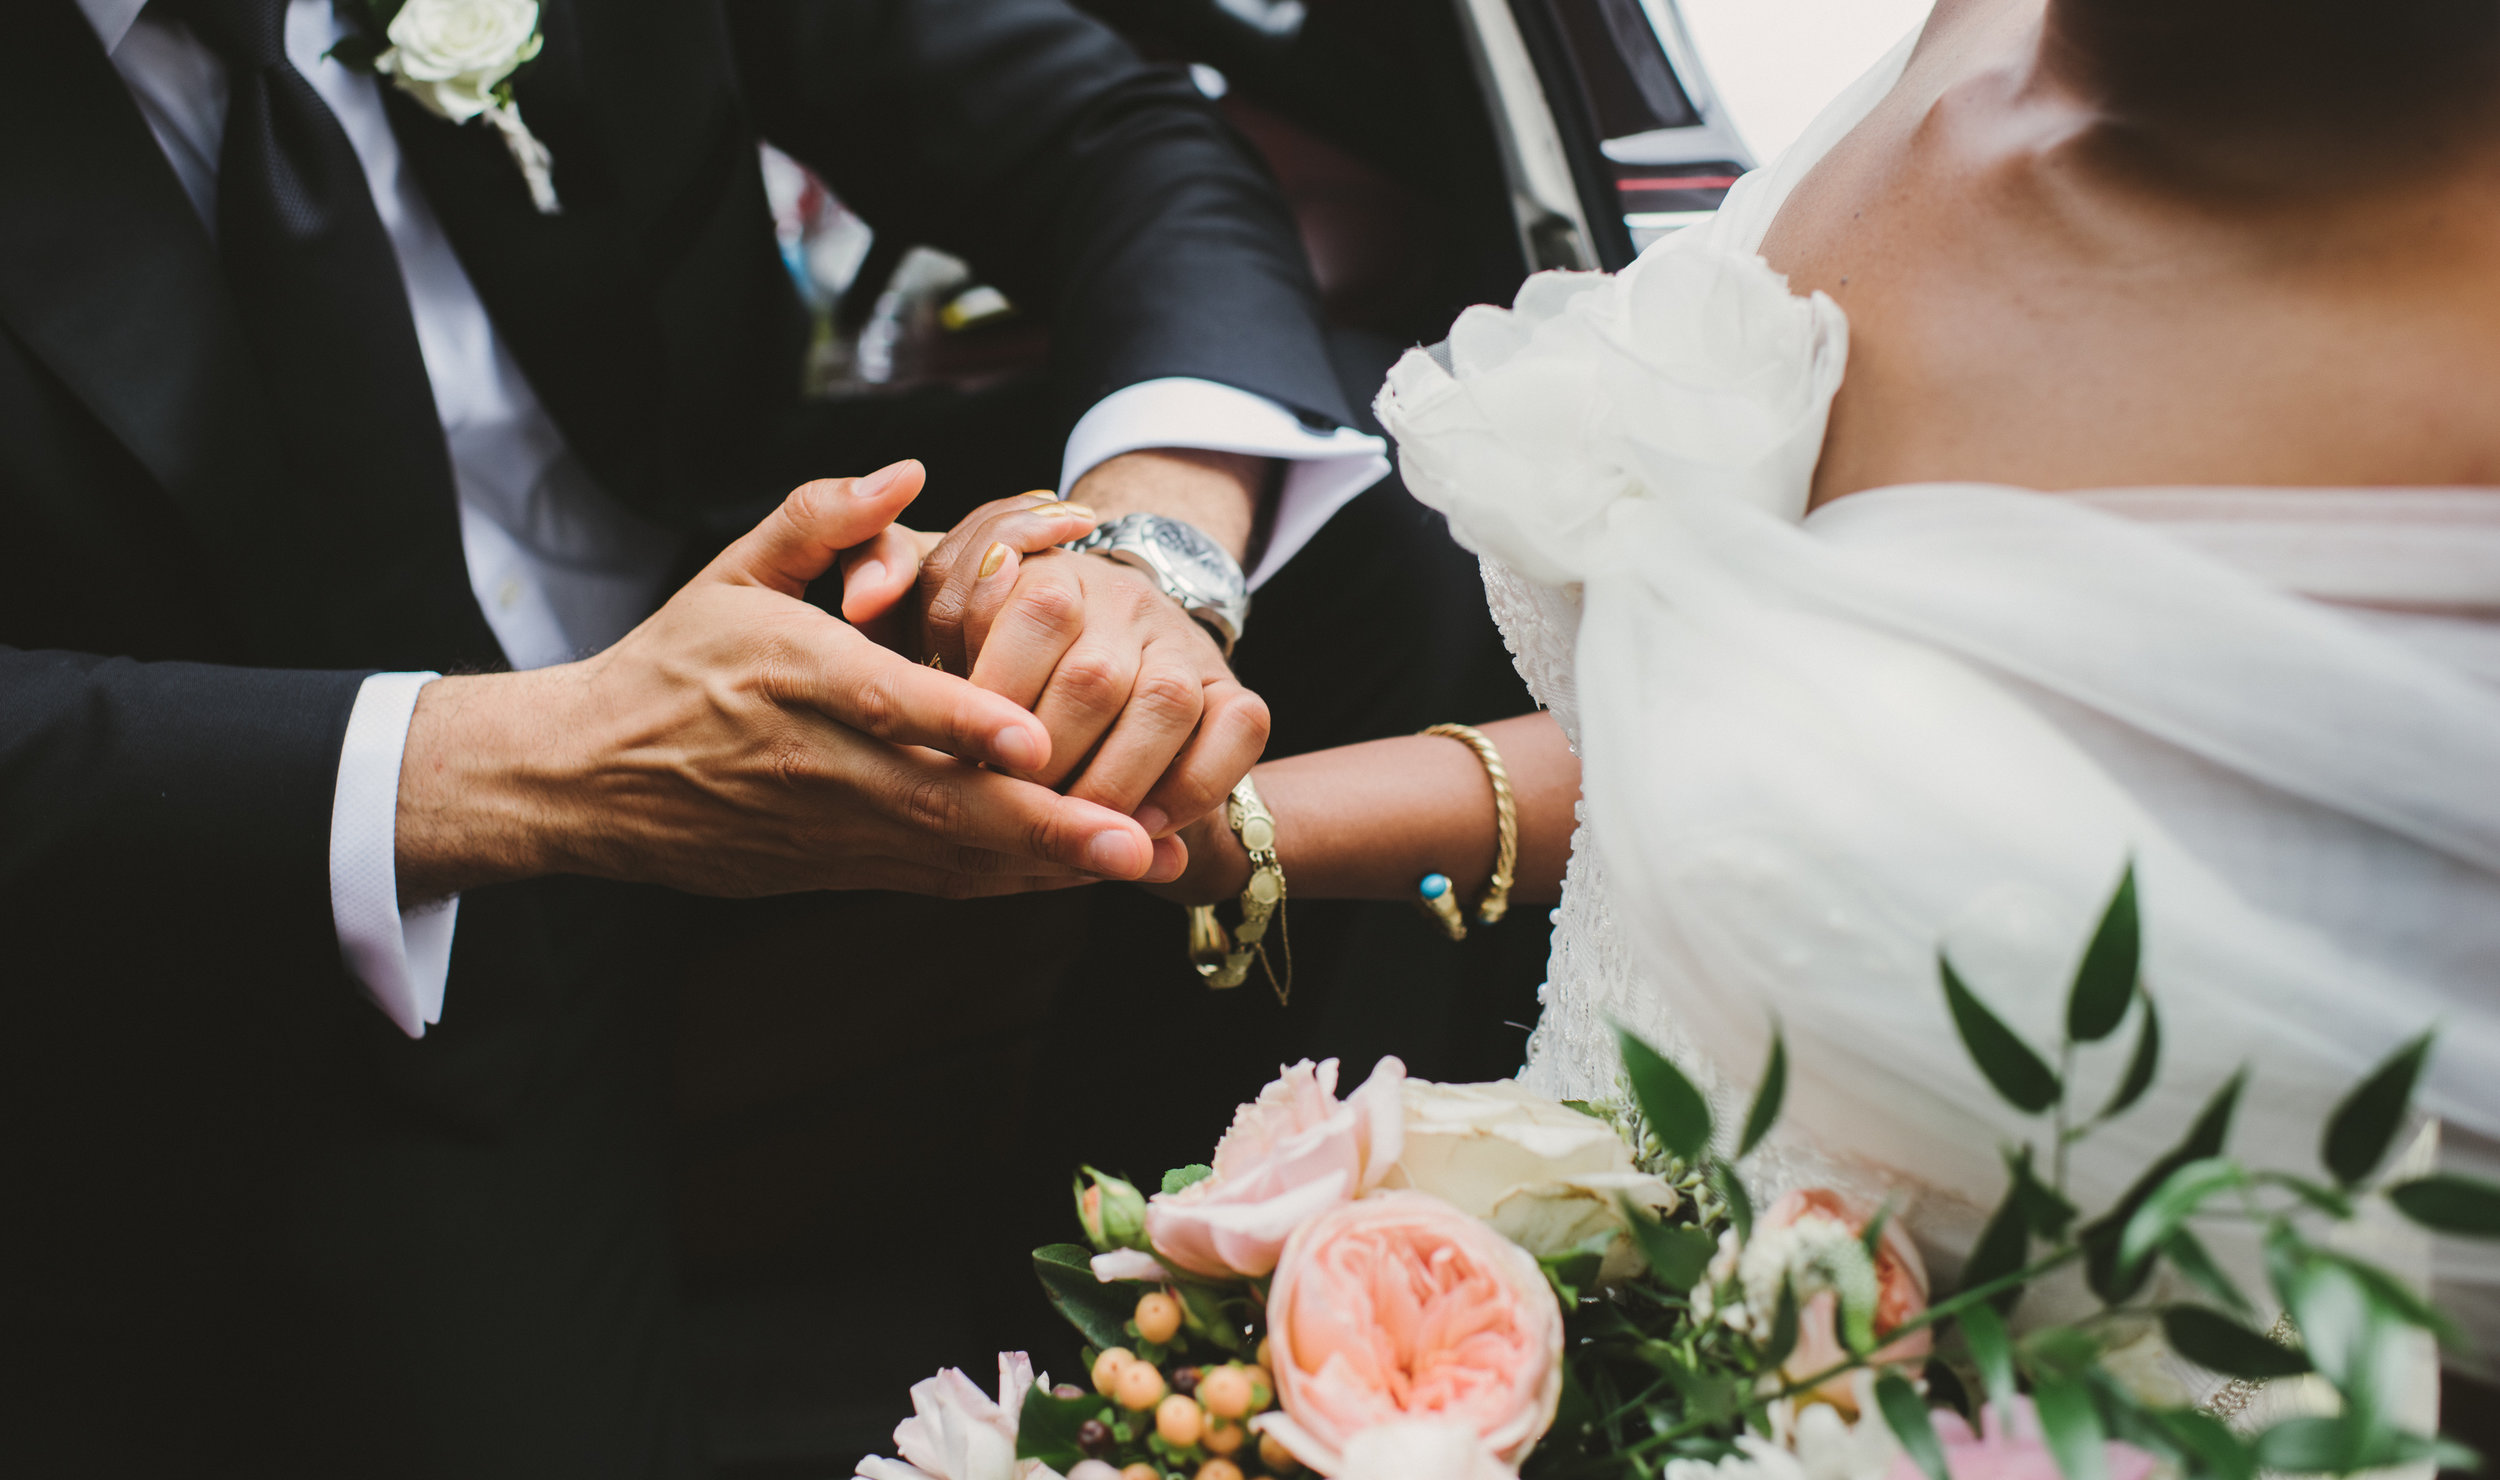 SADATU & KAREEM - GLENVIEW MANSION WEDDING - TWOTWENTY by CHI-CHI AGBIM-203.jpg